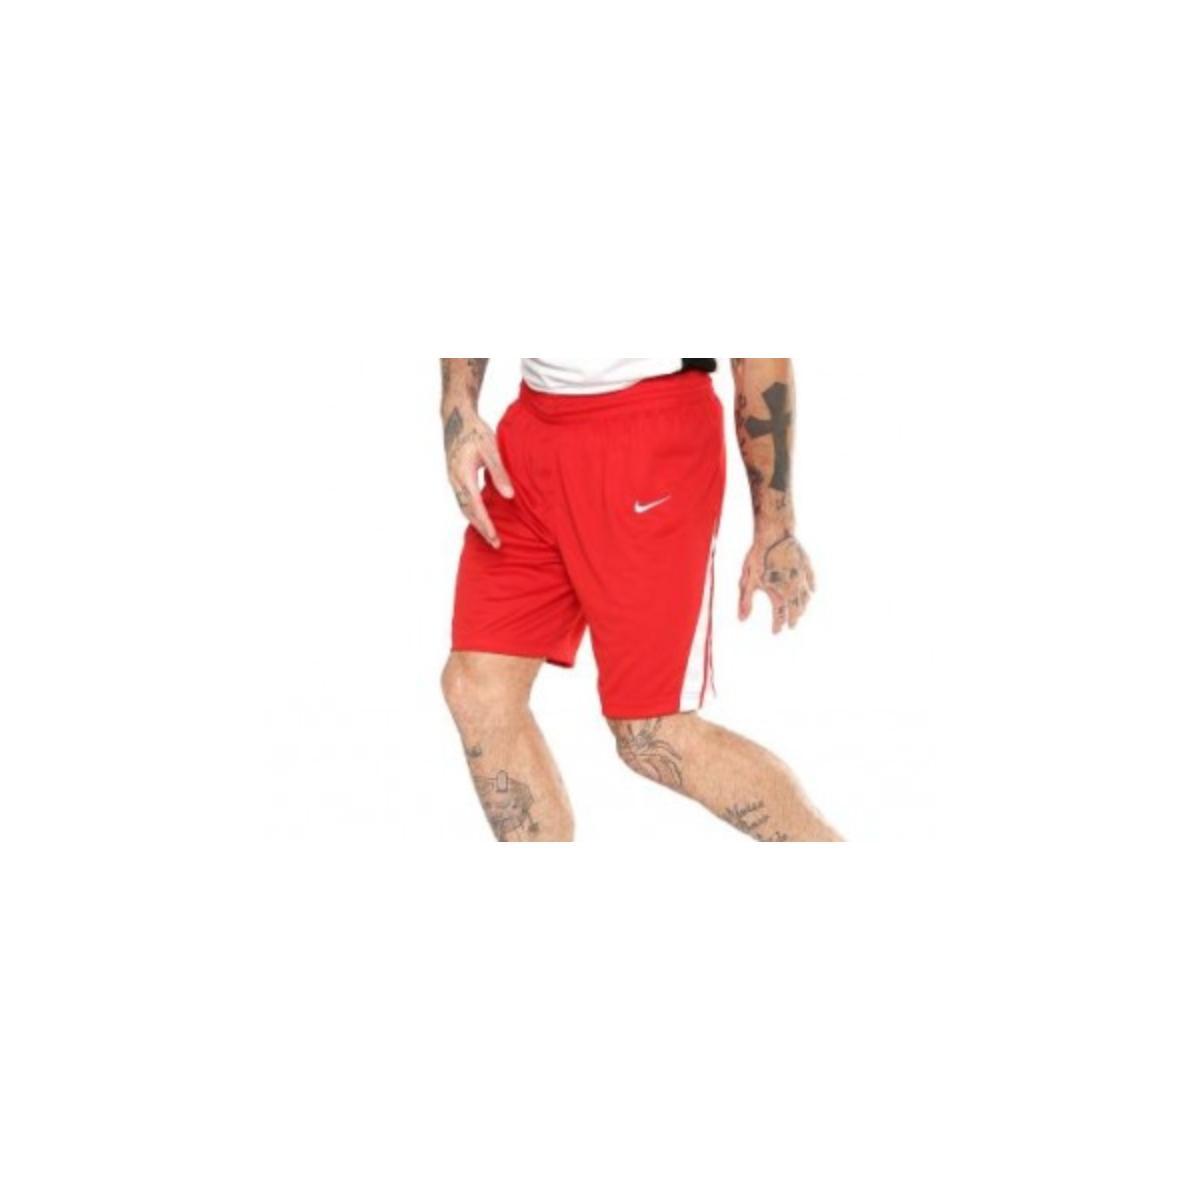 Calçao Masculino Nike 932171-658 m nk National Stk Vermelho/branco